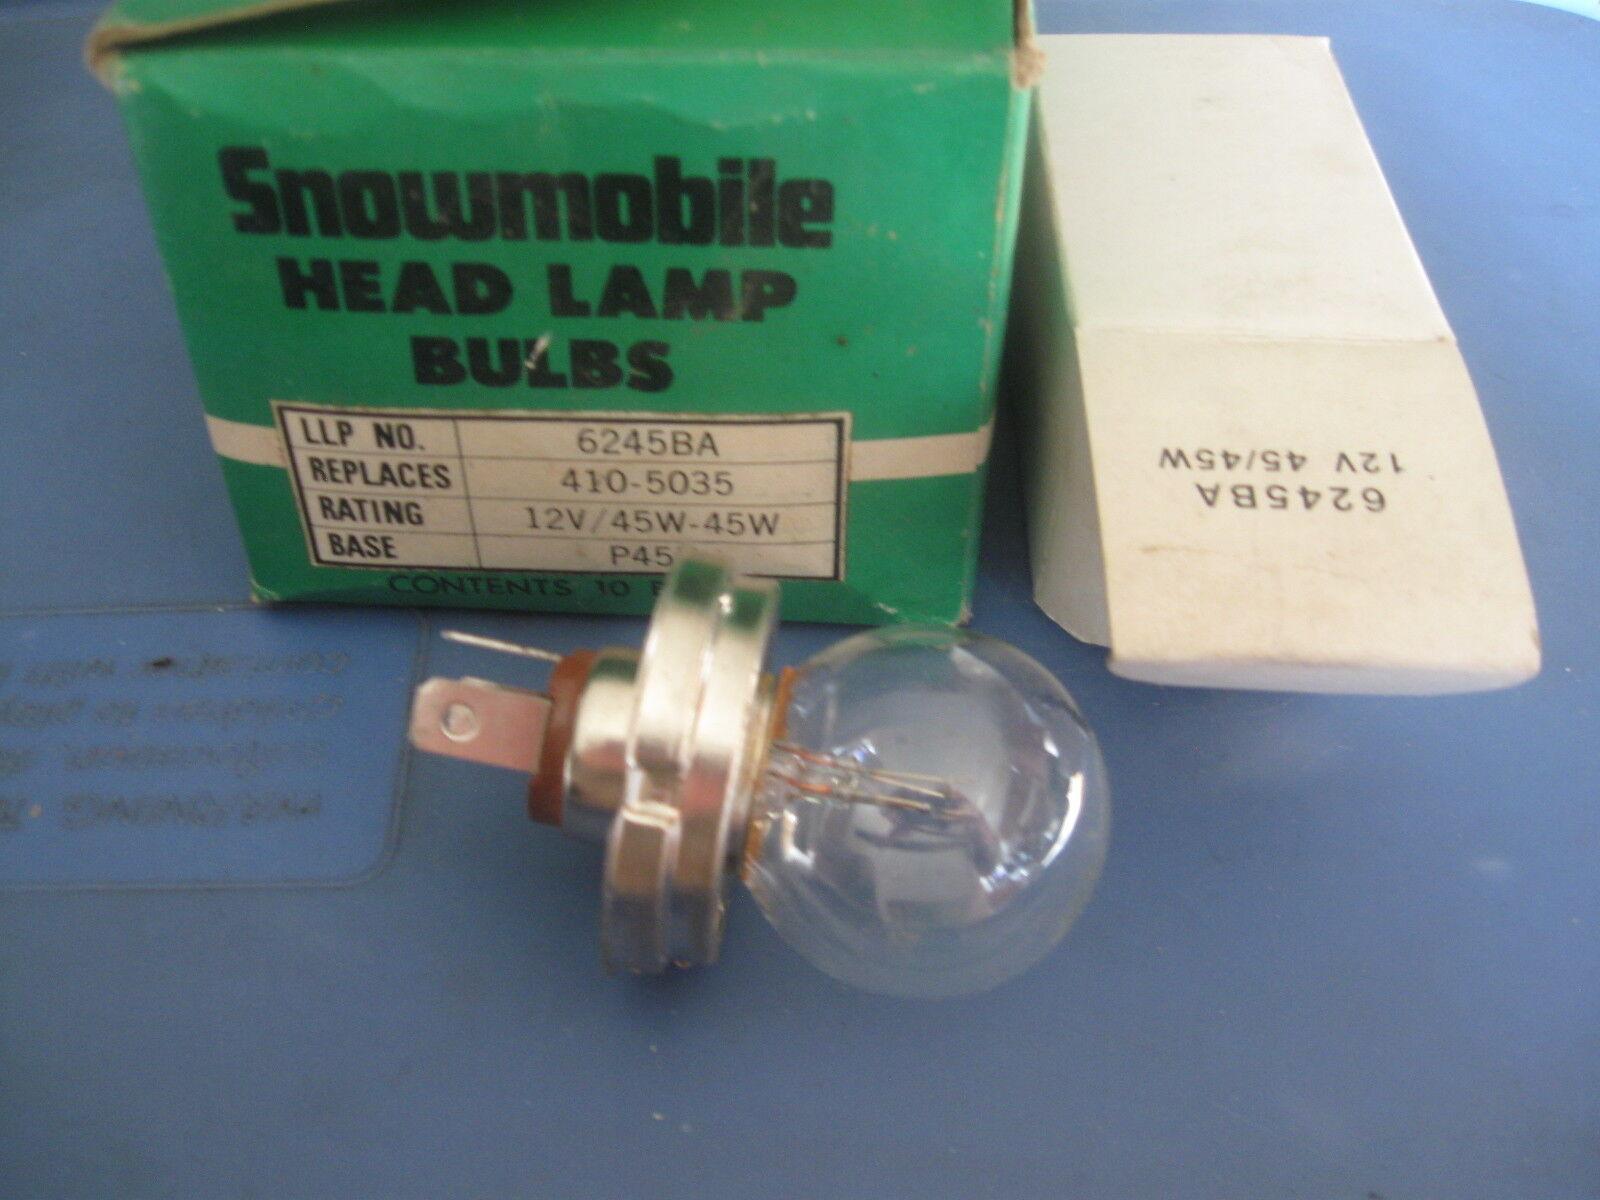 Snowmobile Headlight Bulb. 6245BA. 12V45/45 W. P45T Base. NOS LLP Brand